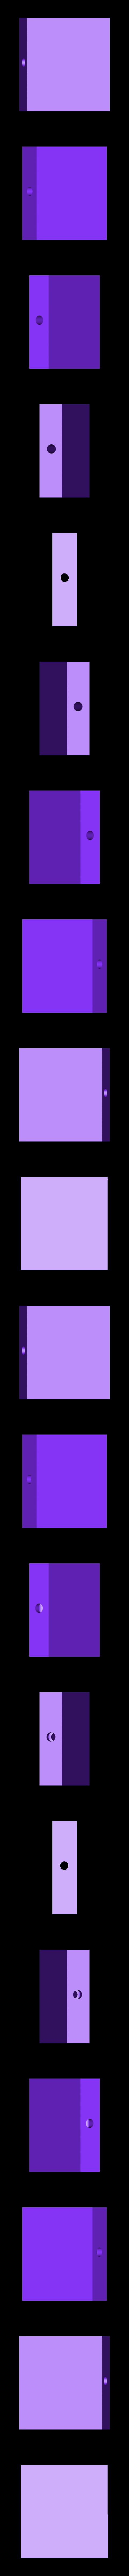 door.stl Download free STL file Cyclops 3 - Box case • 3D printer design, Gophy